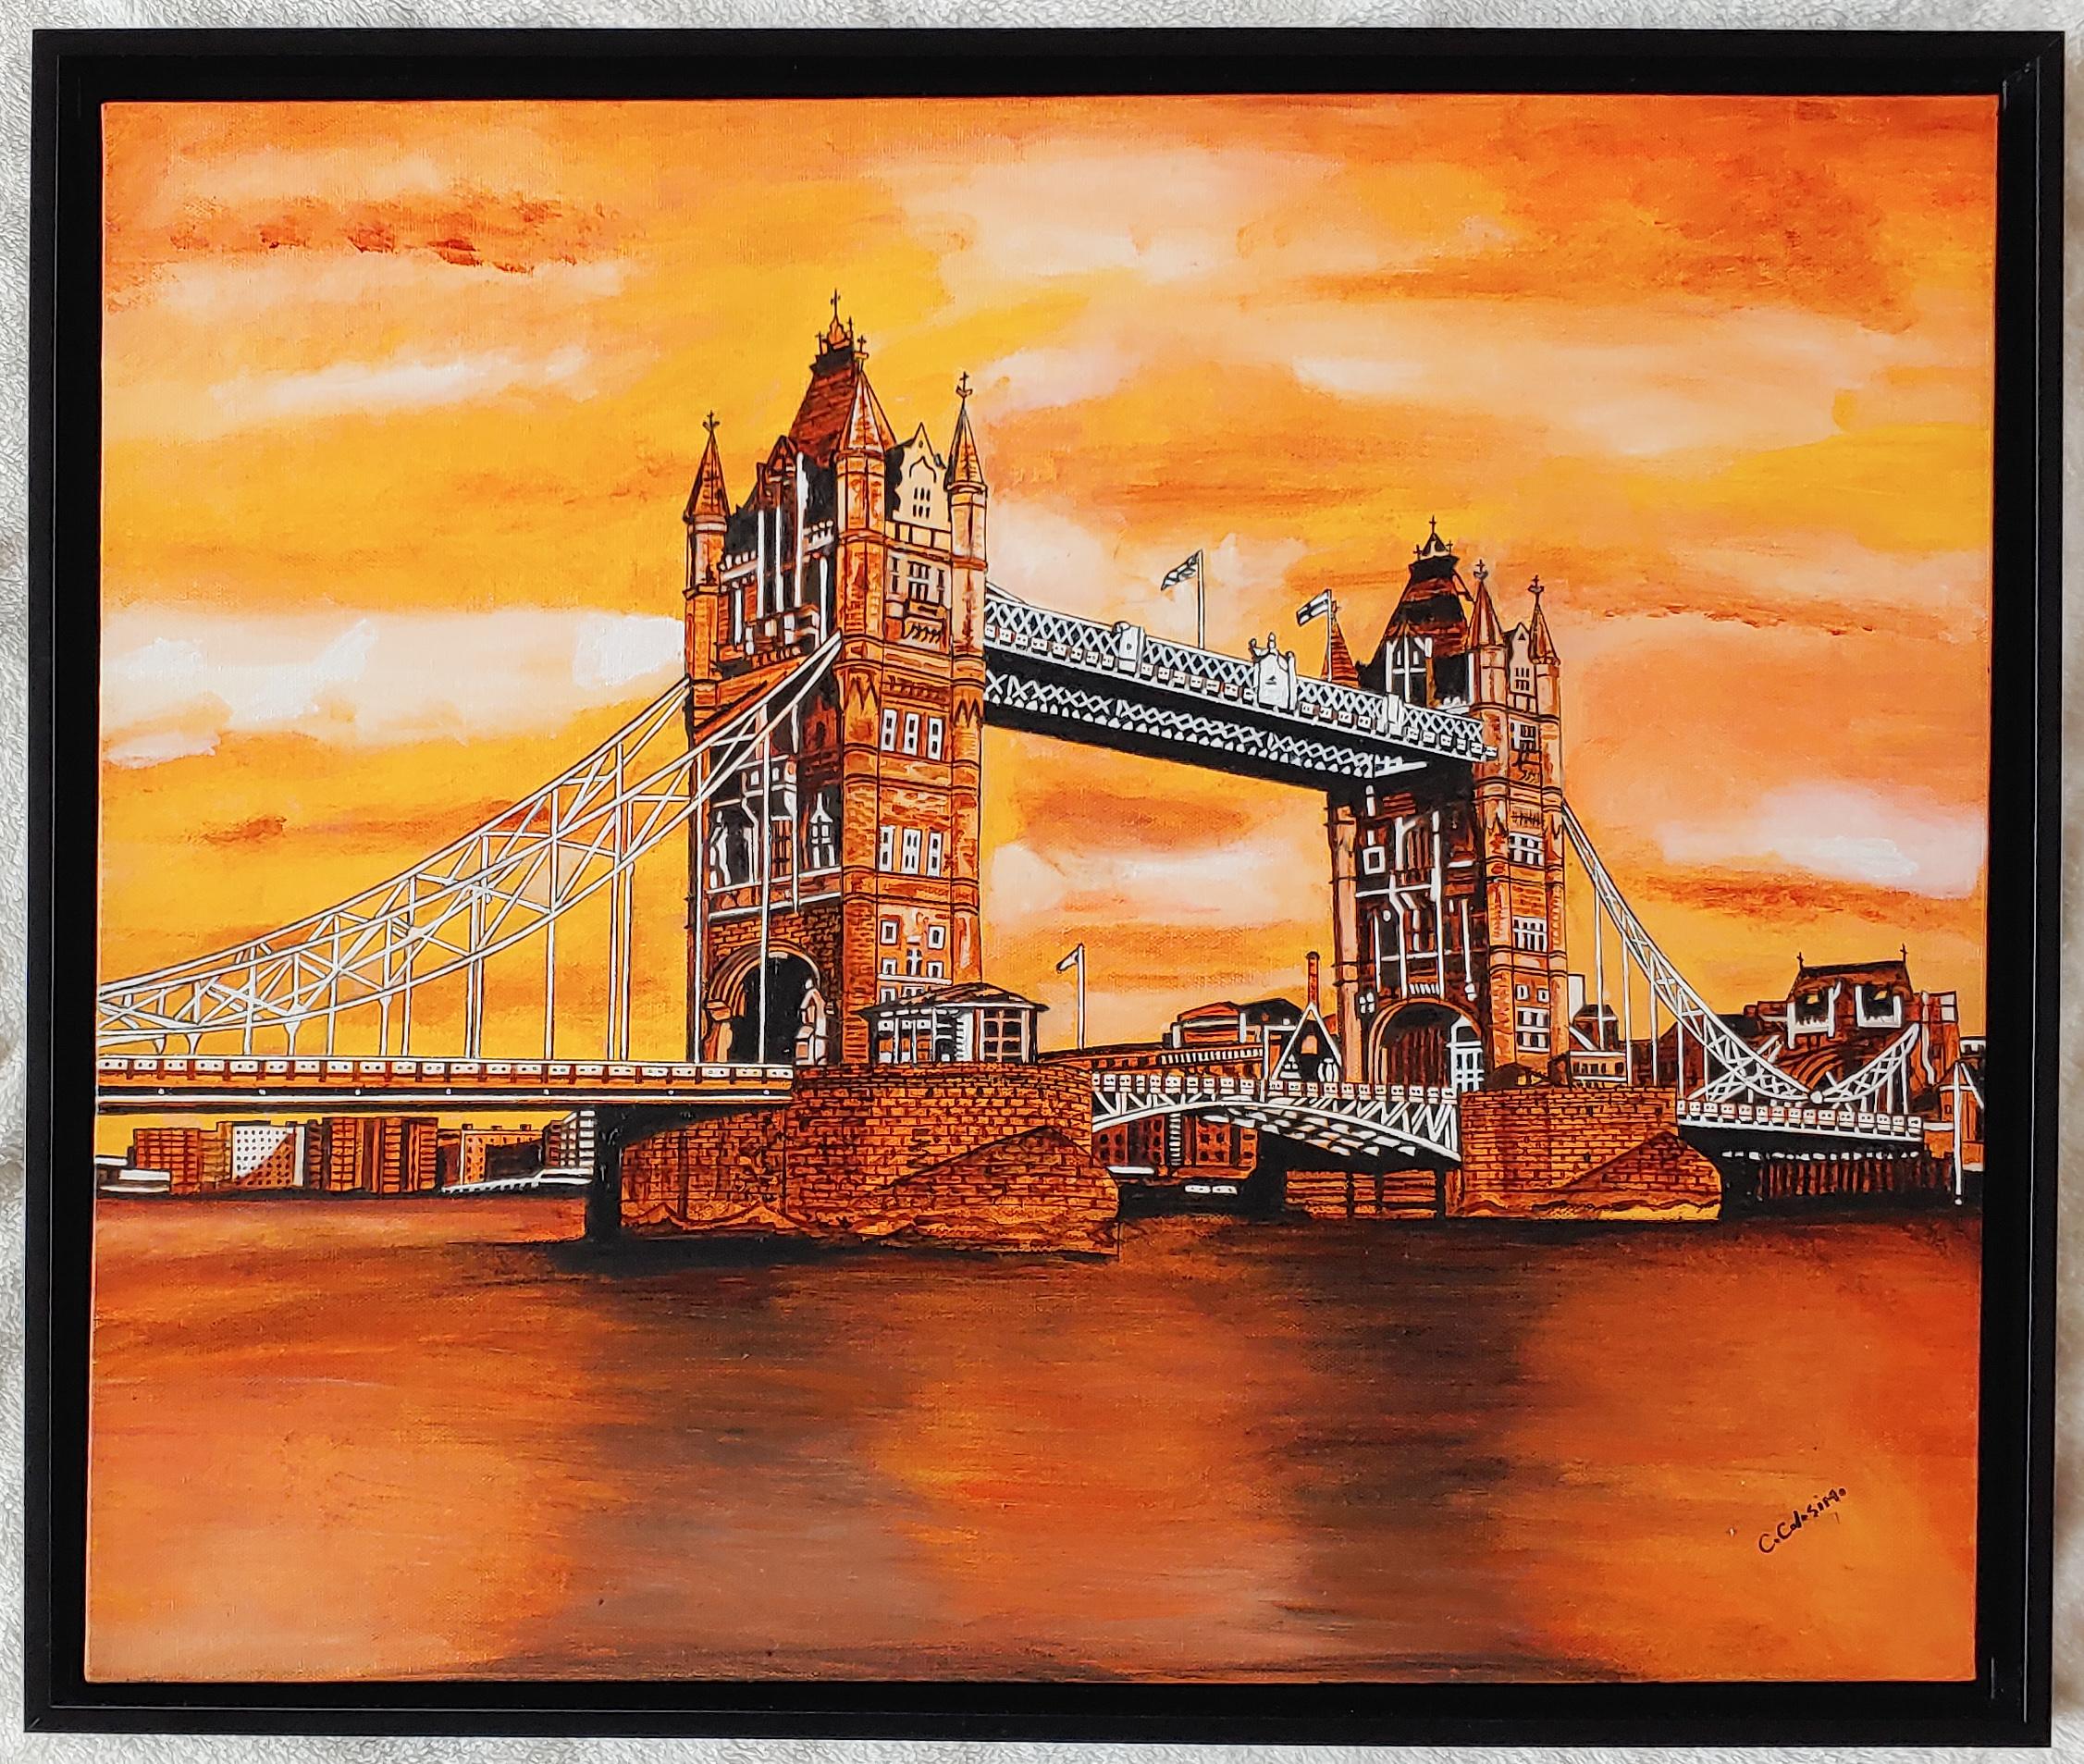 Tower Bridge Iconic Landmark